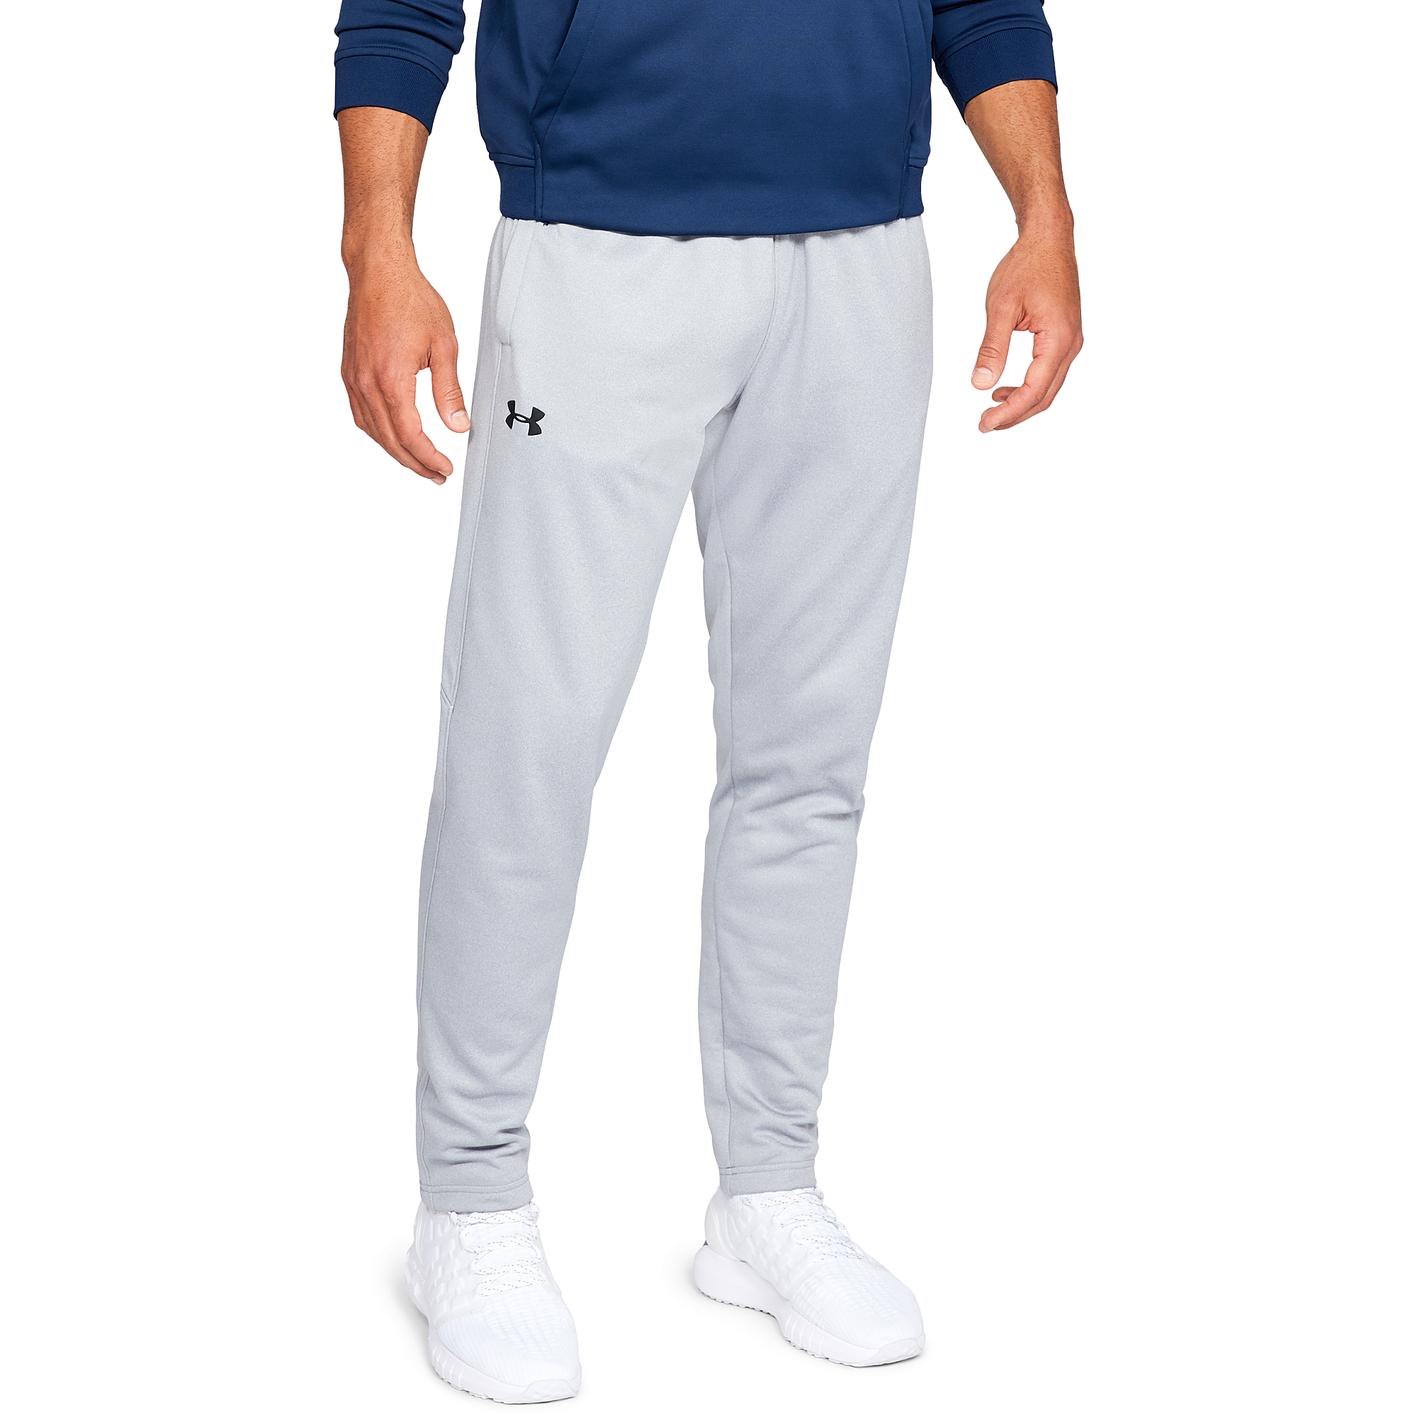 300717d7 Under Armour Armour Fleece Pants - Men's - Training - Clothing ...